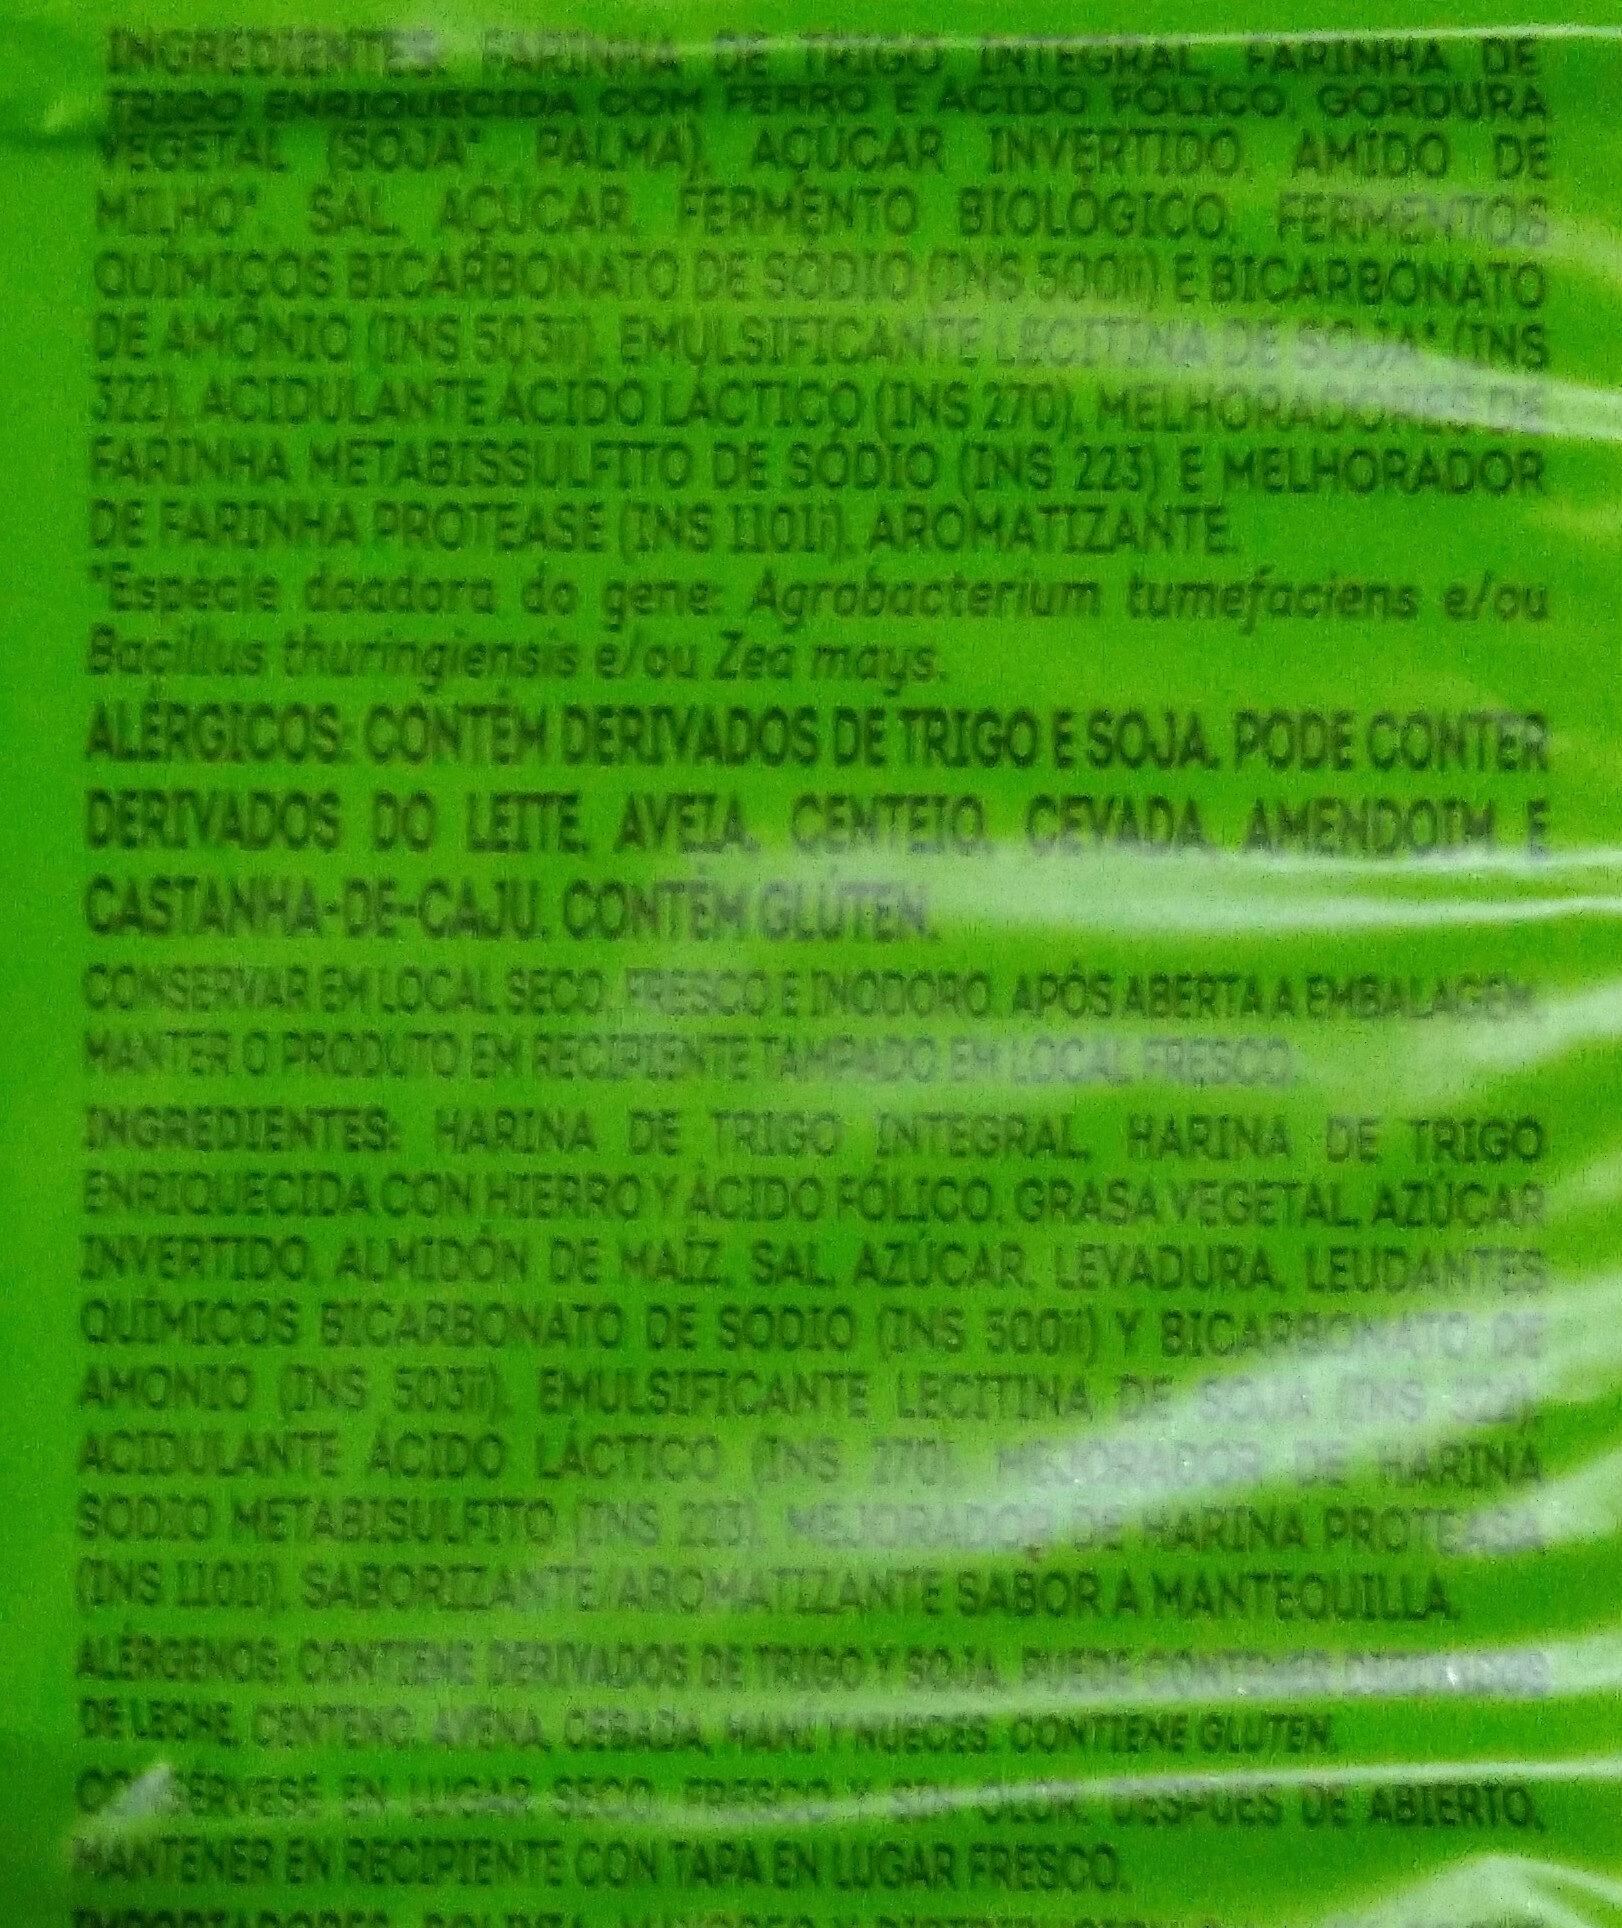 Cream Cracker integral - Ingredientes - pt